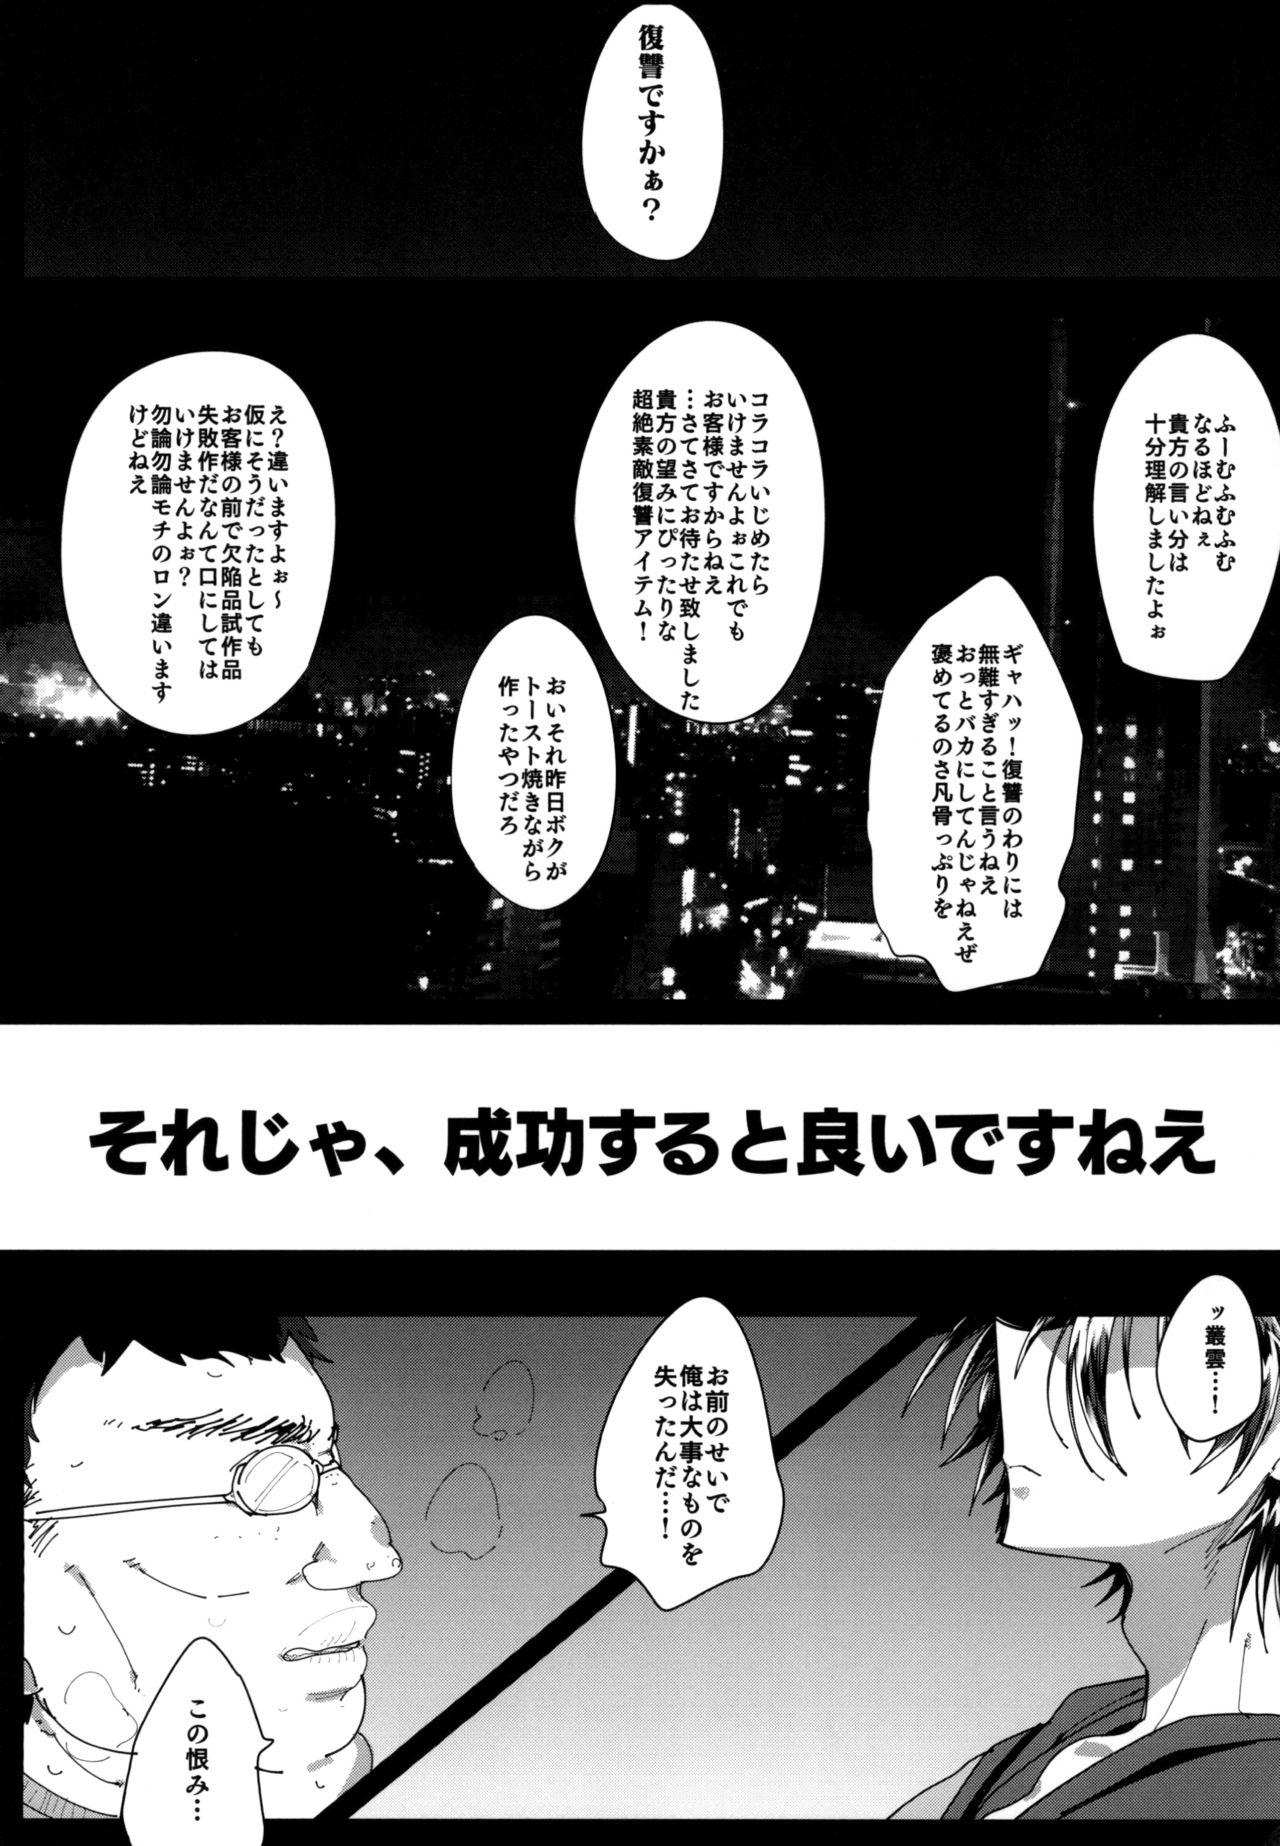 Kurokami Sanpakugan Megane Danshi TS Kyousei Fukujuu Fuck 2